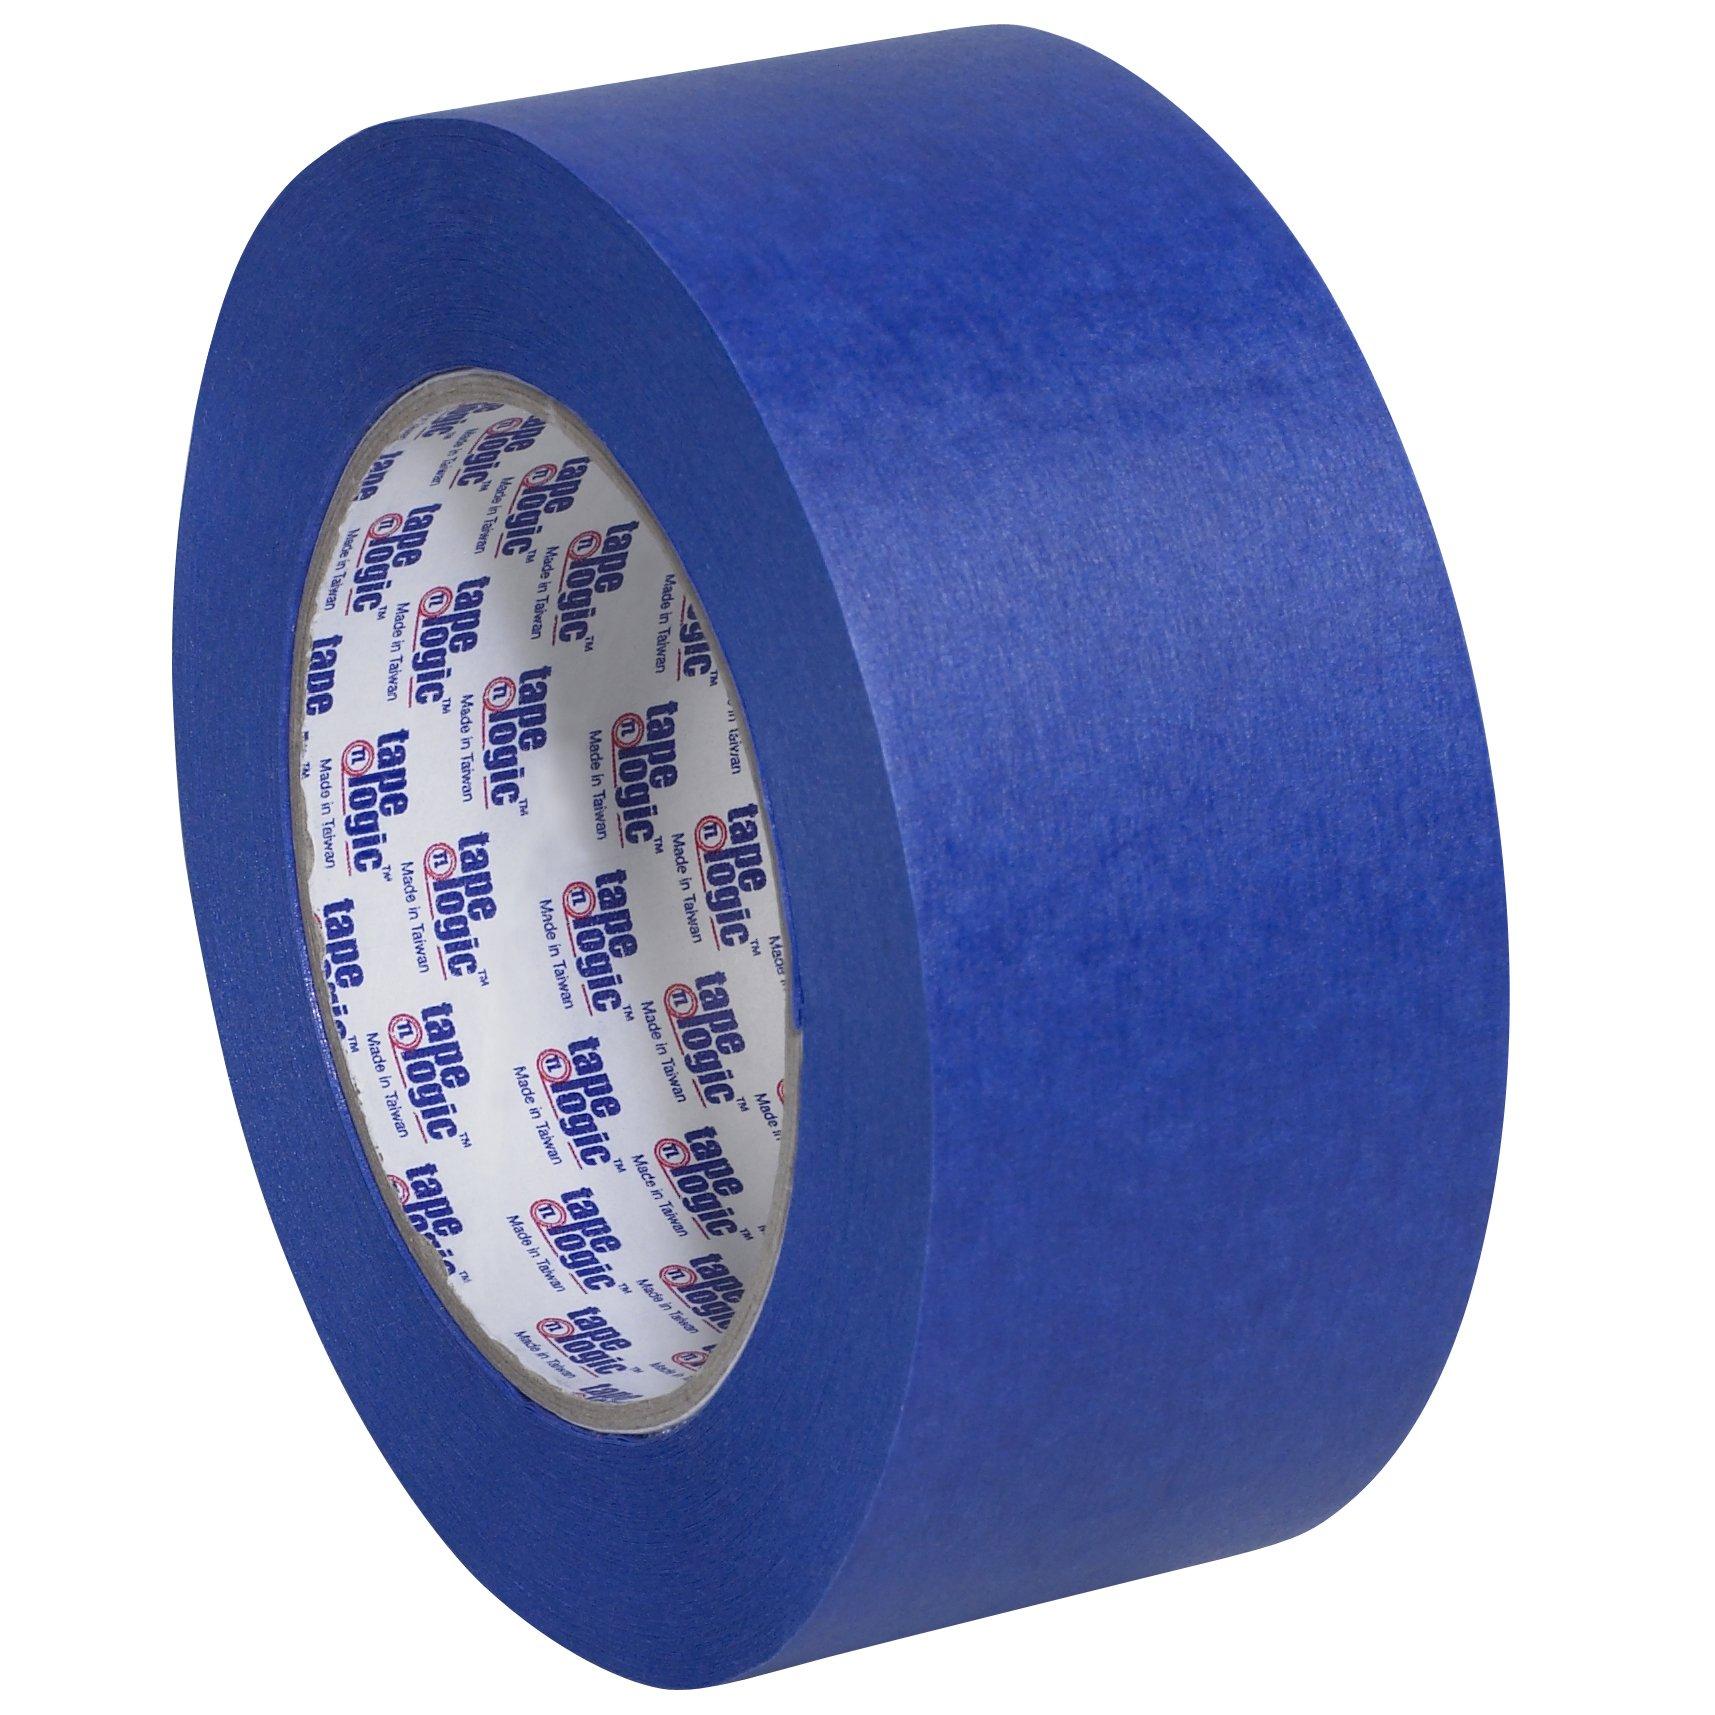 Tape Logic T937300012PK Painter's Tape, 60 yds Length x 2'' Width, Blue (Case of 12) by Tape Logic